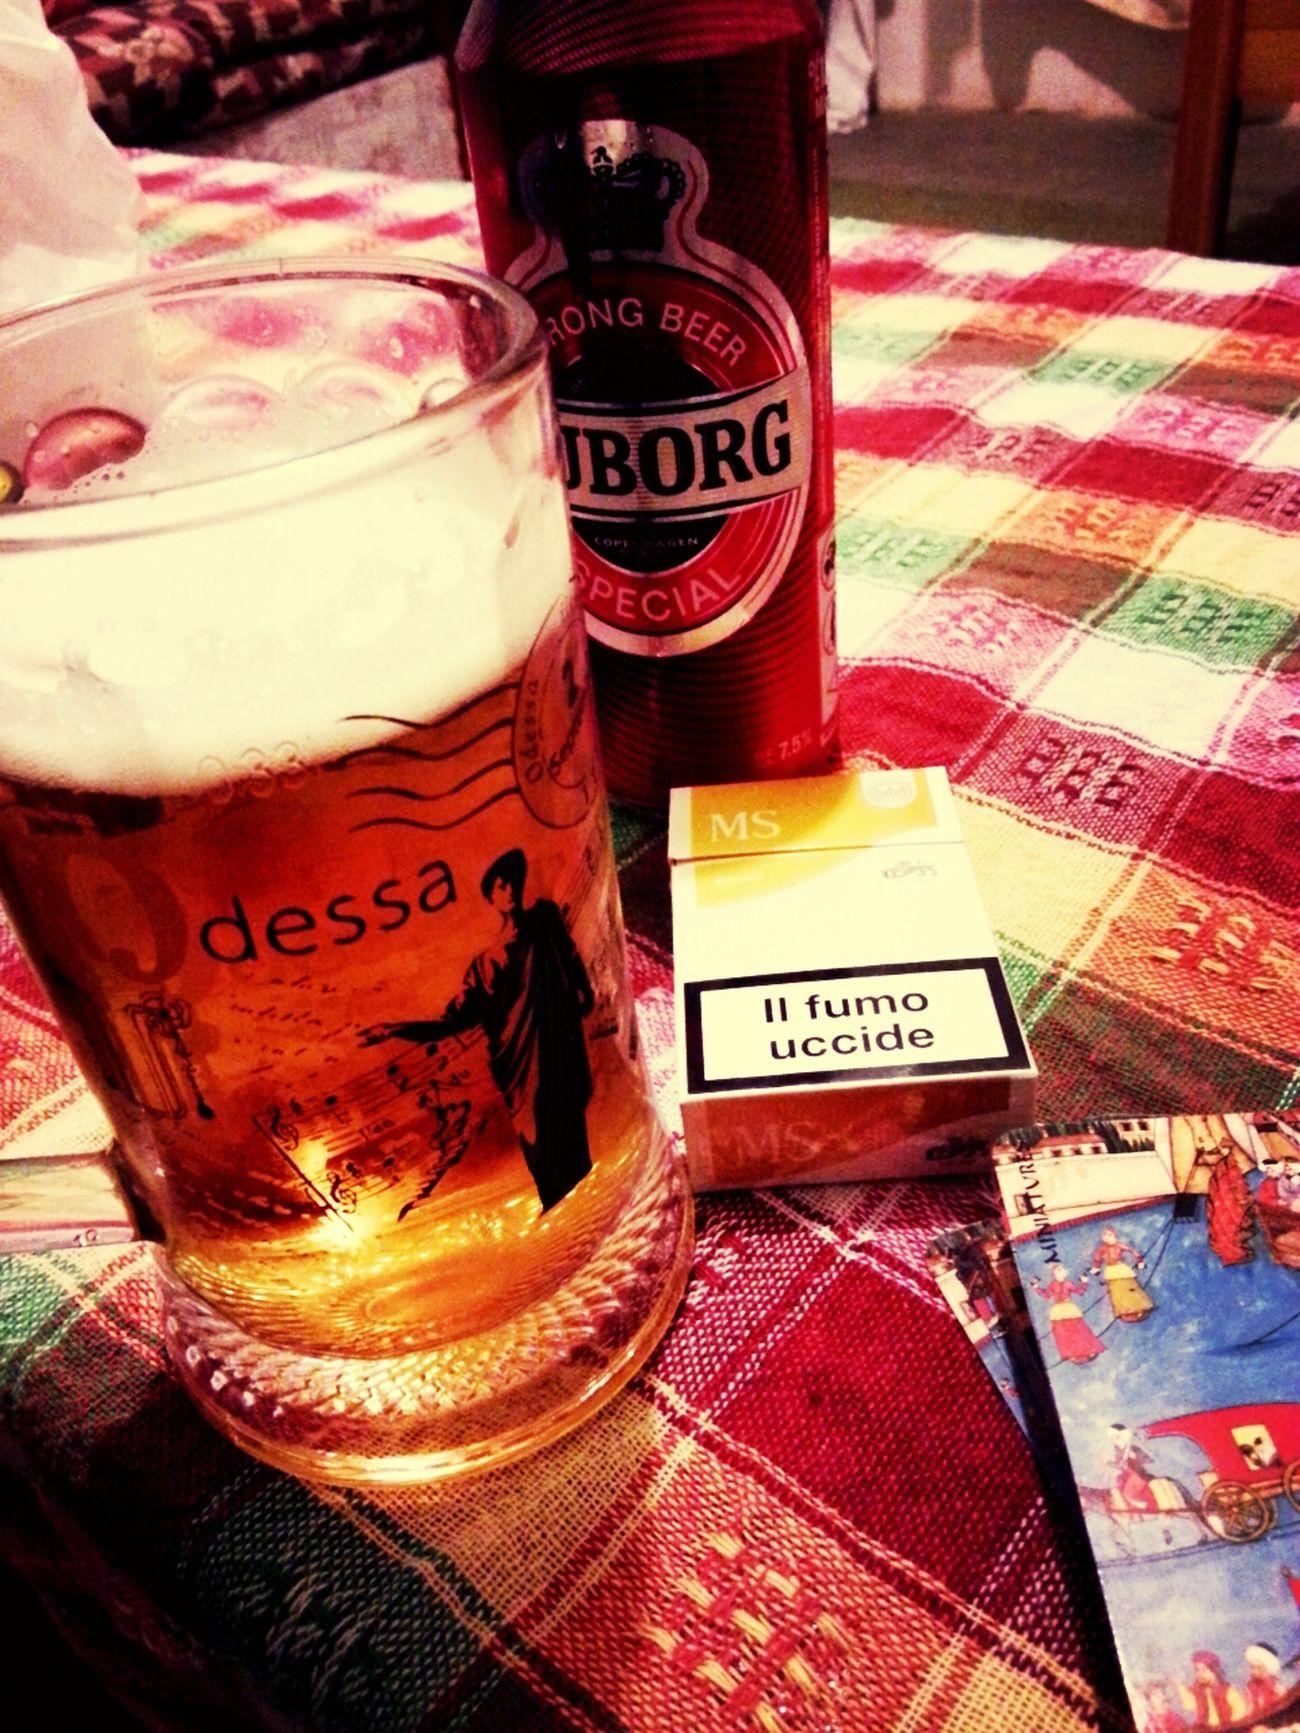 Odessa Rome Fethiye ınternational Beer Beerporn Nosmoking HomeAlone Tuborg Icecoldbeer